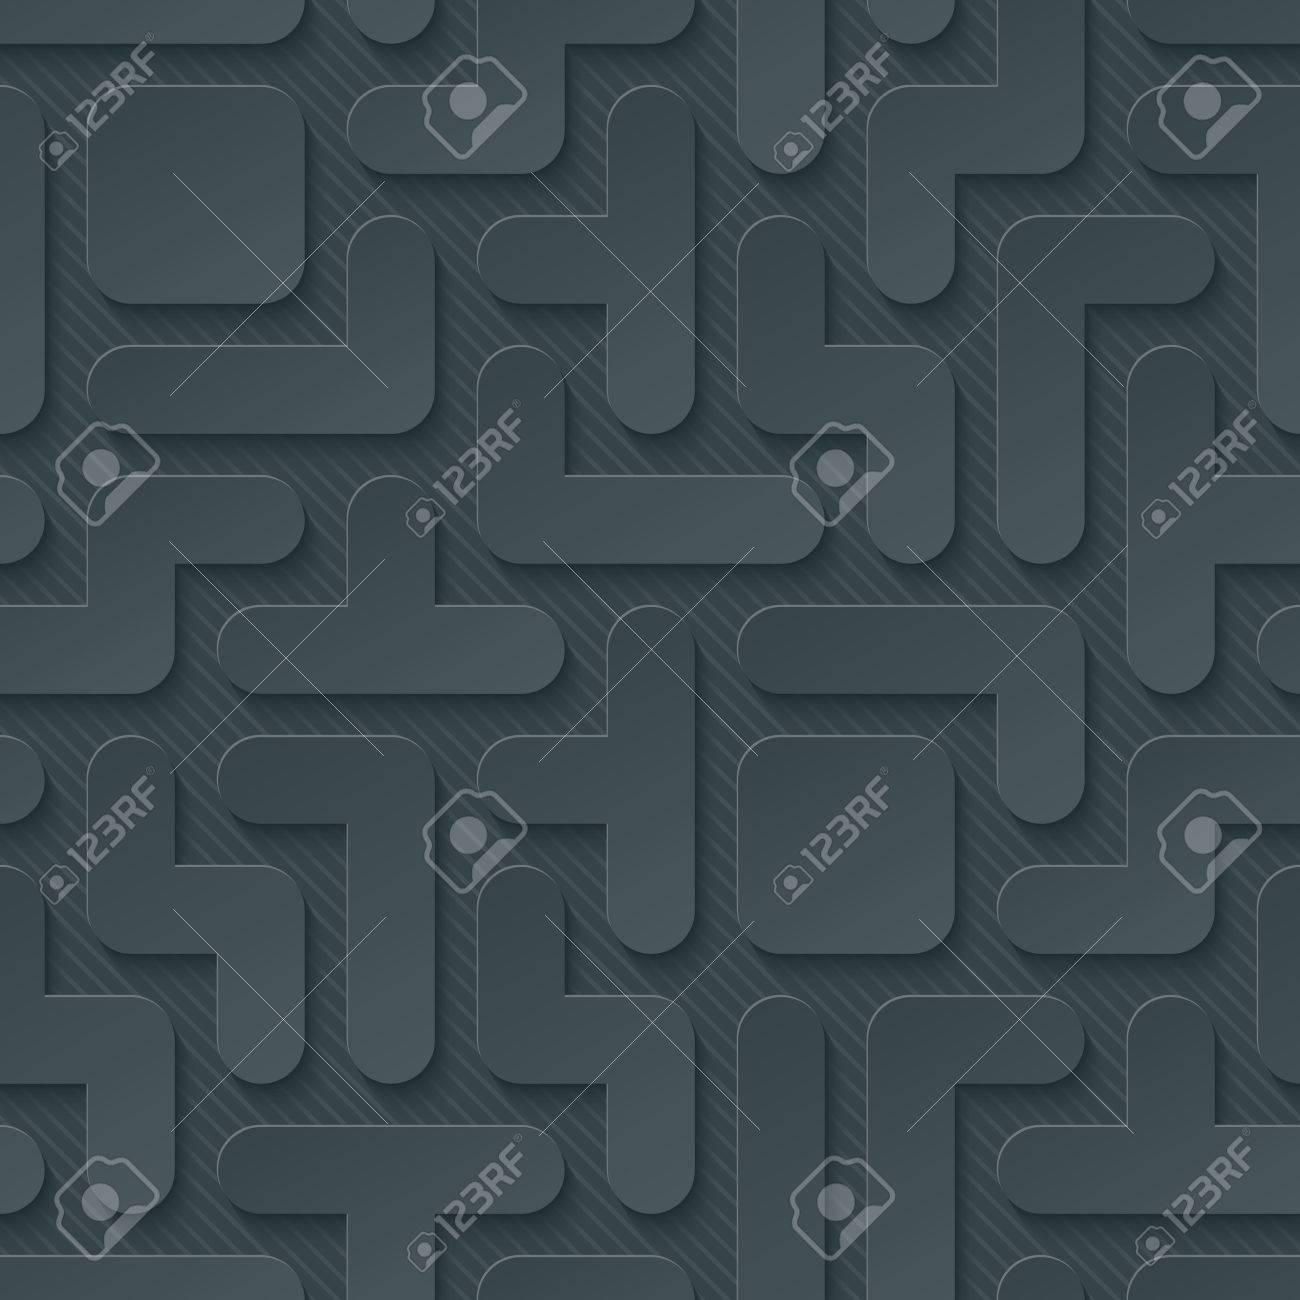 Tetris Wallpaper 3d Seamless Background Vector EPS10 Royalty 1300x1300